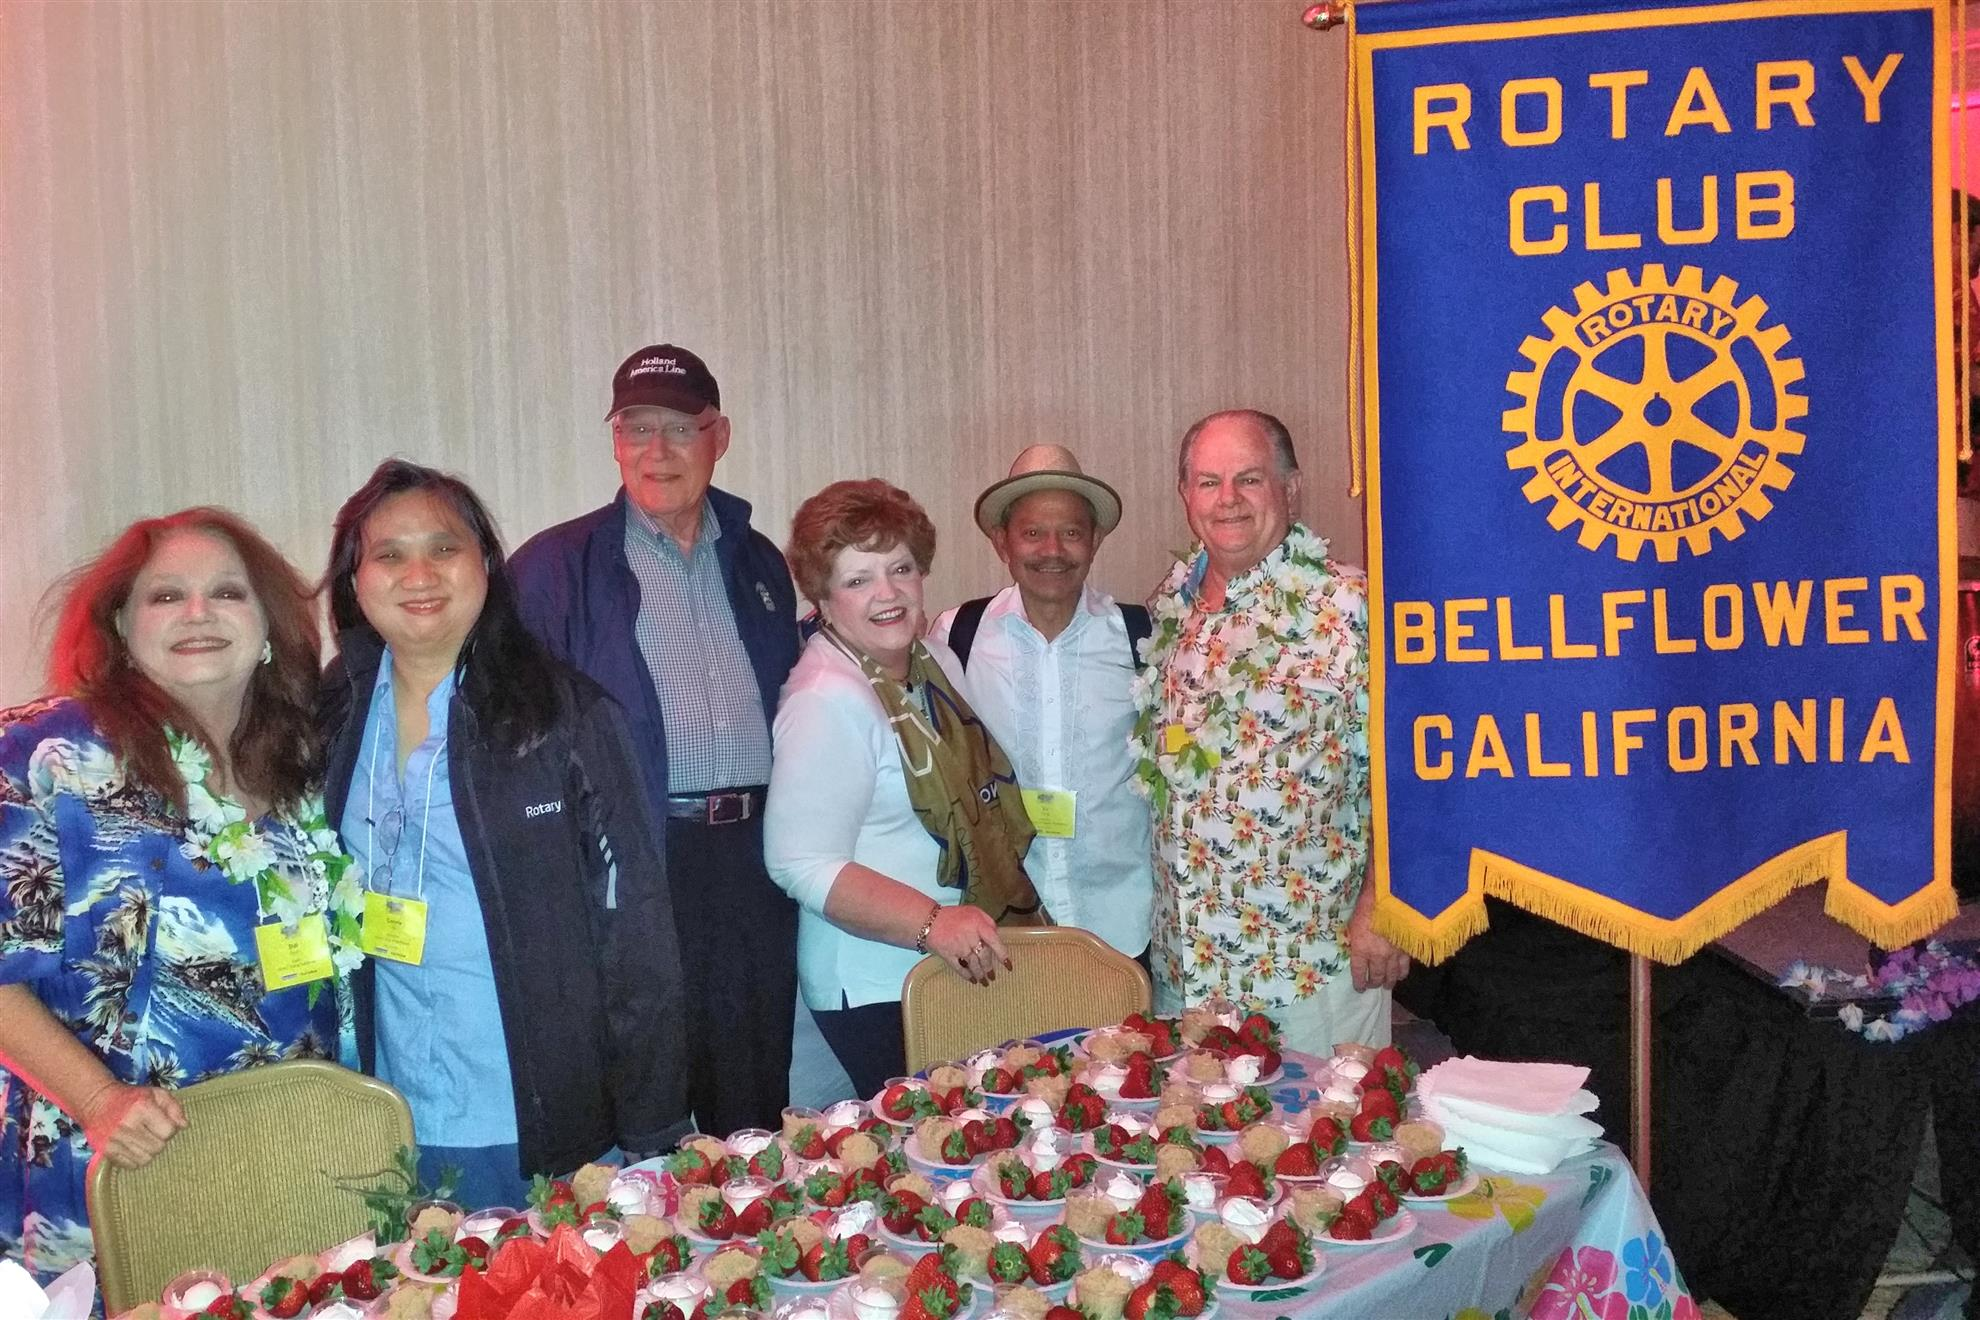 Stories | Rotary Club of Bellflower - A 100% Paul Harris Club